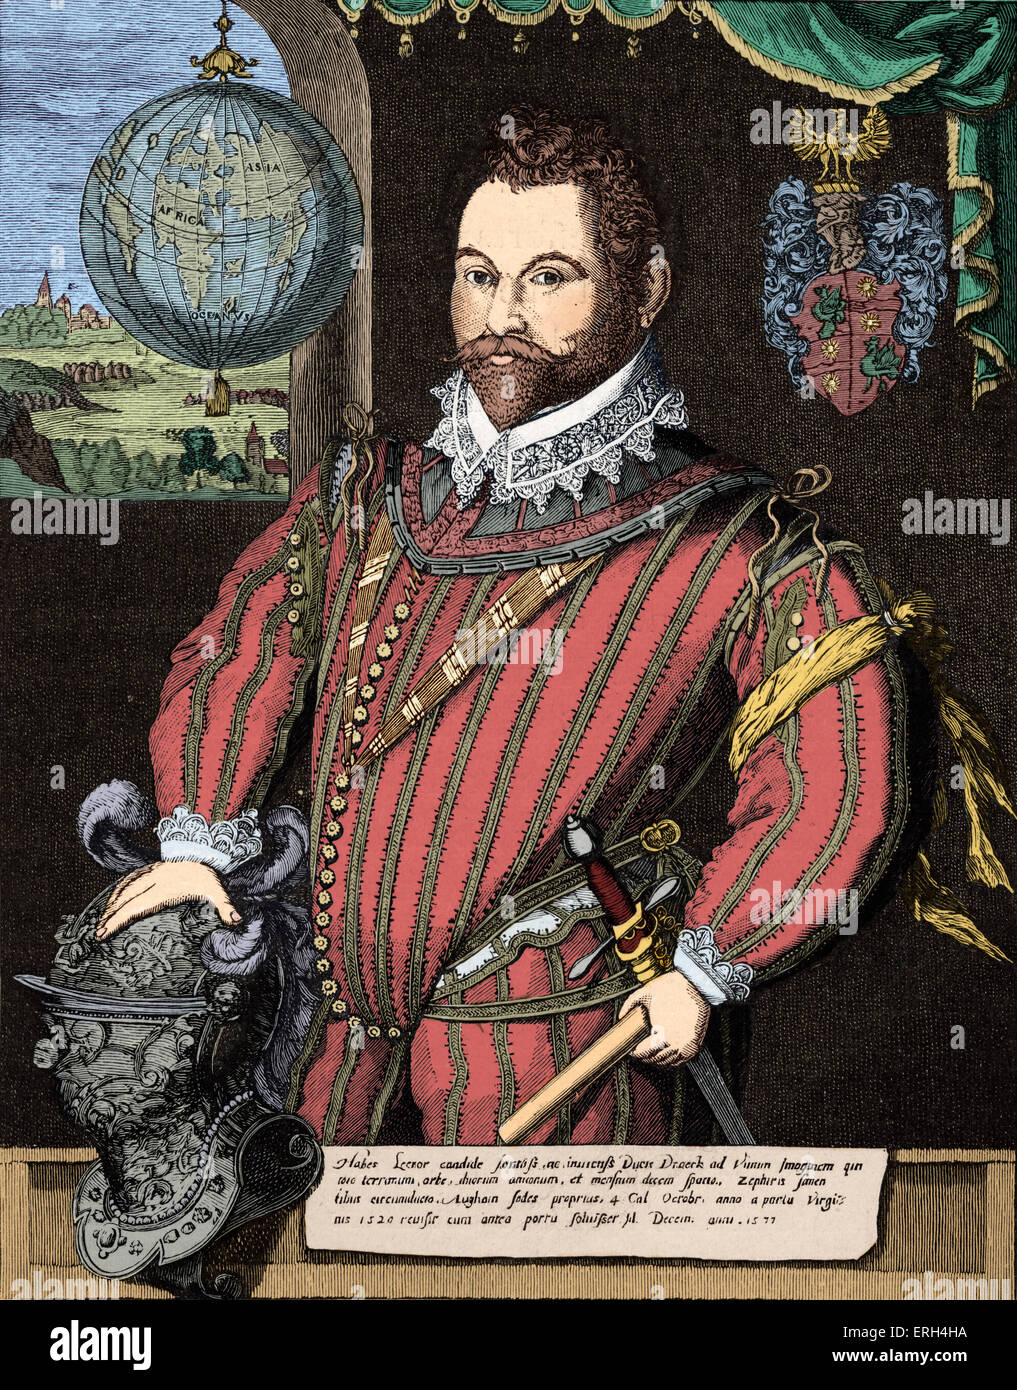 Sir Francis Drake - portrait of the English navigator, sailor and politician. c. 1540 – 28 January 1596. Colourised - Stock Image